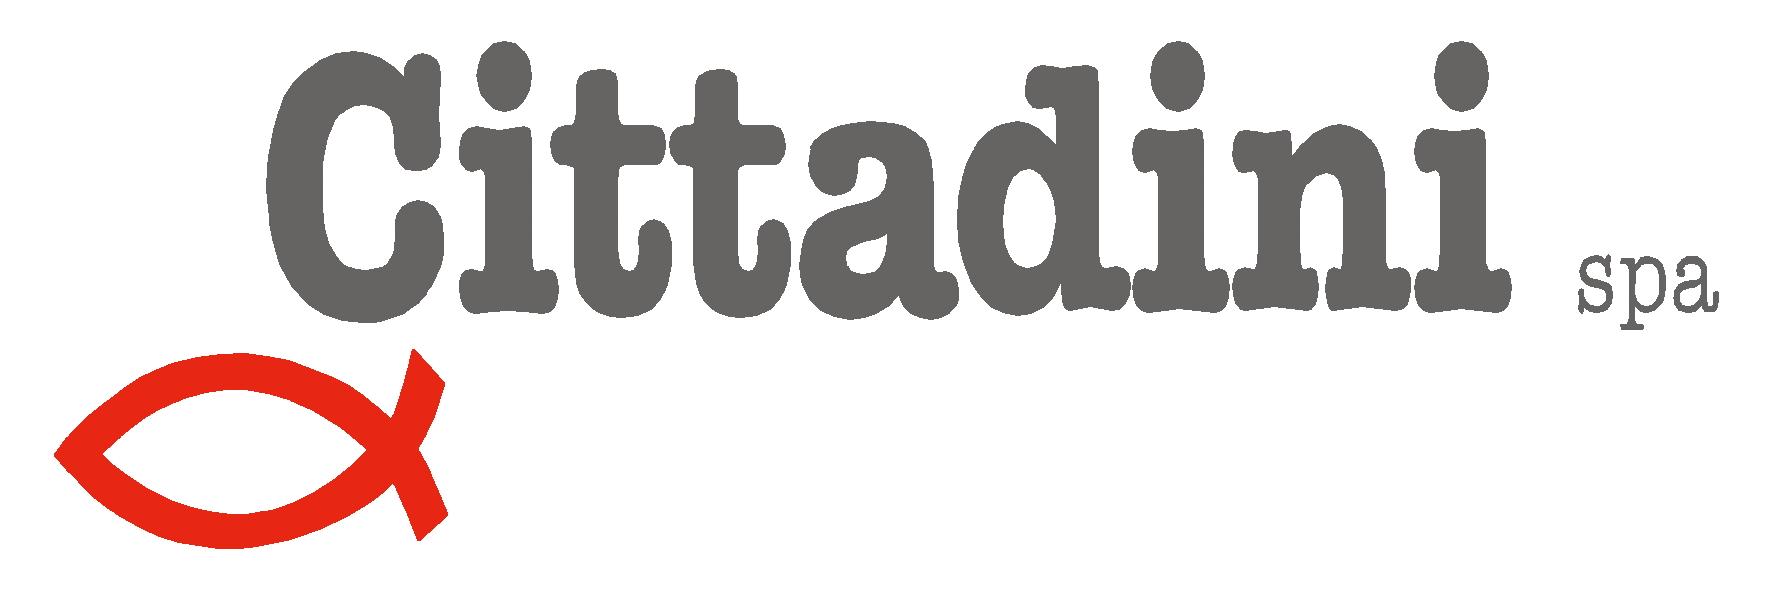 Cittadini S.p.a.